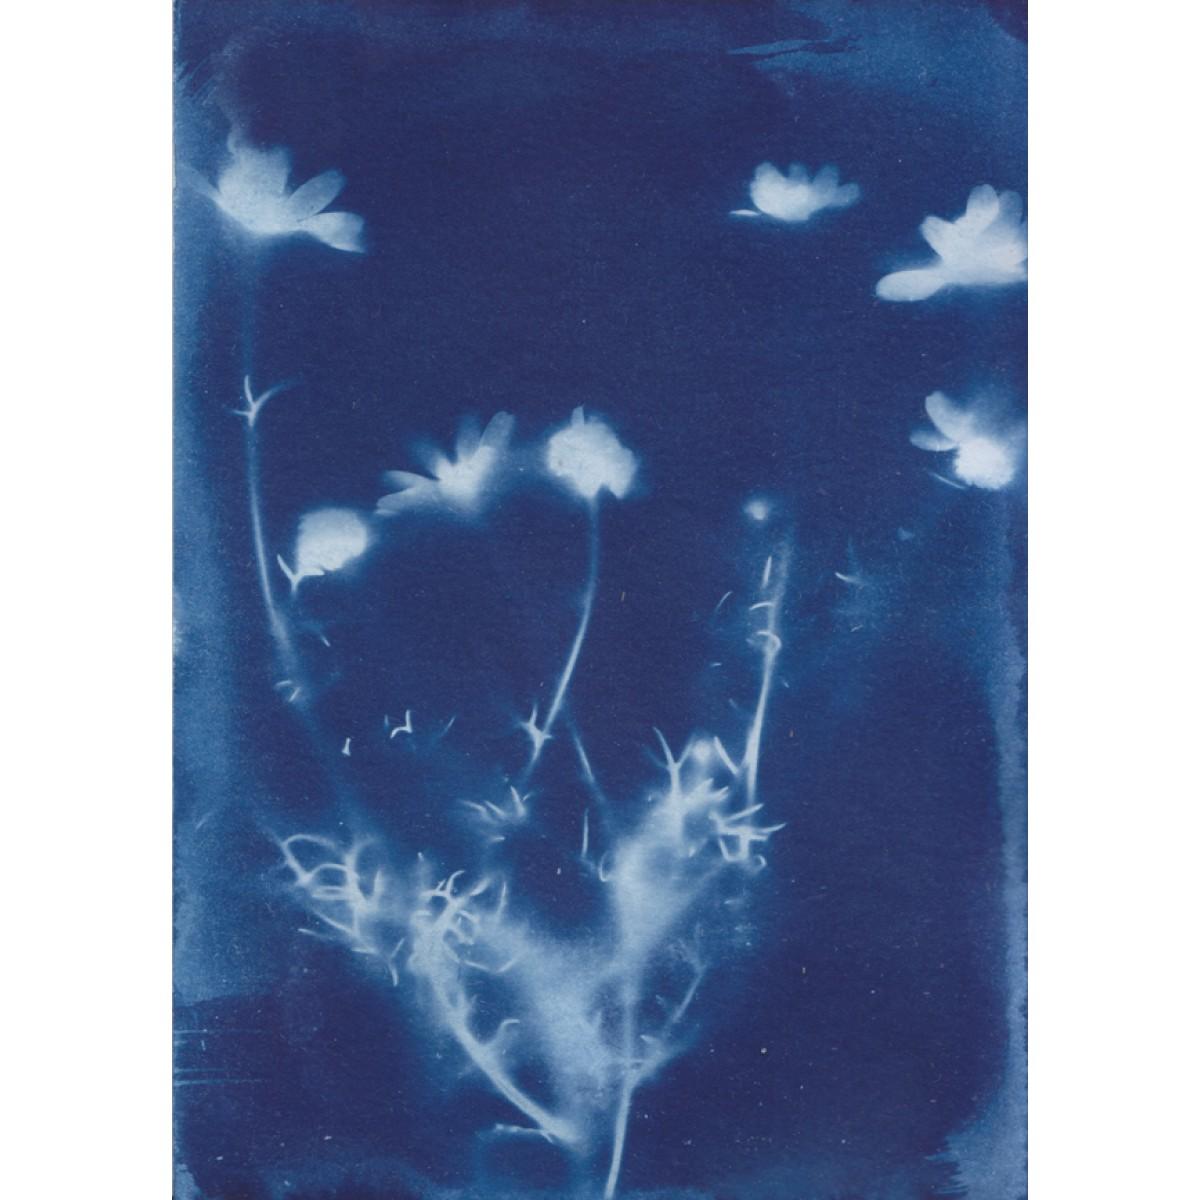 Anka Büchler, Floraler Blaudruck,Cyanotypie, Unikat, A6, Motiv 13